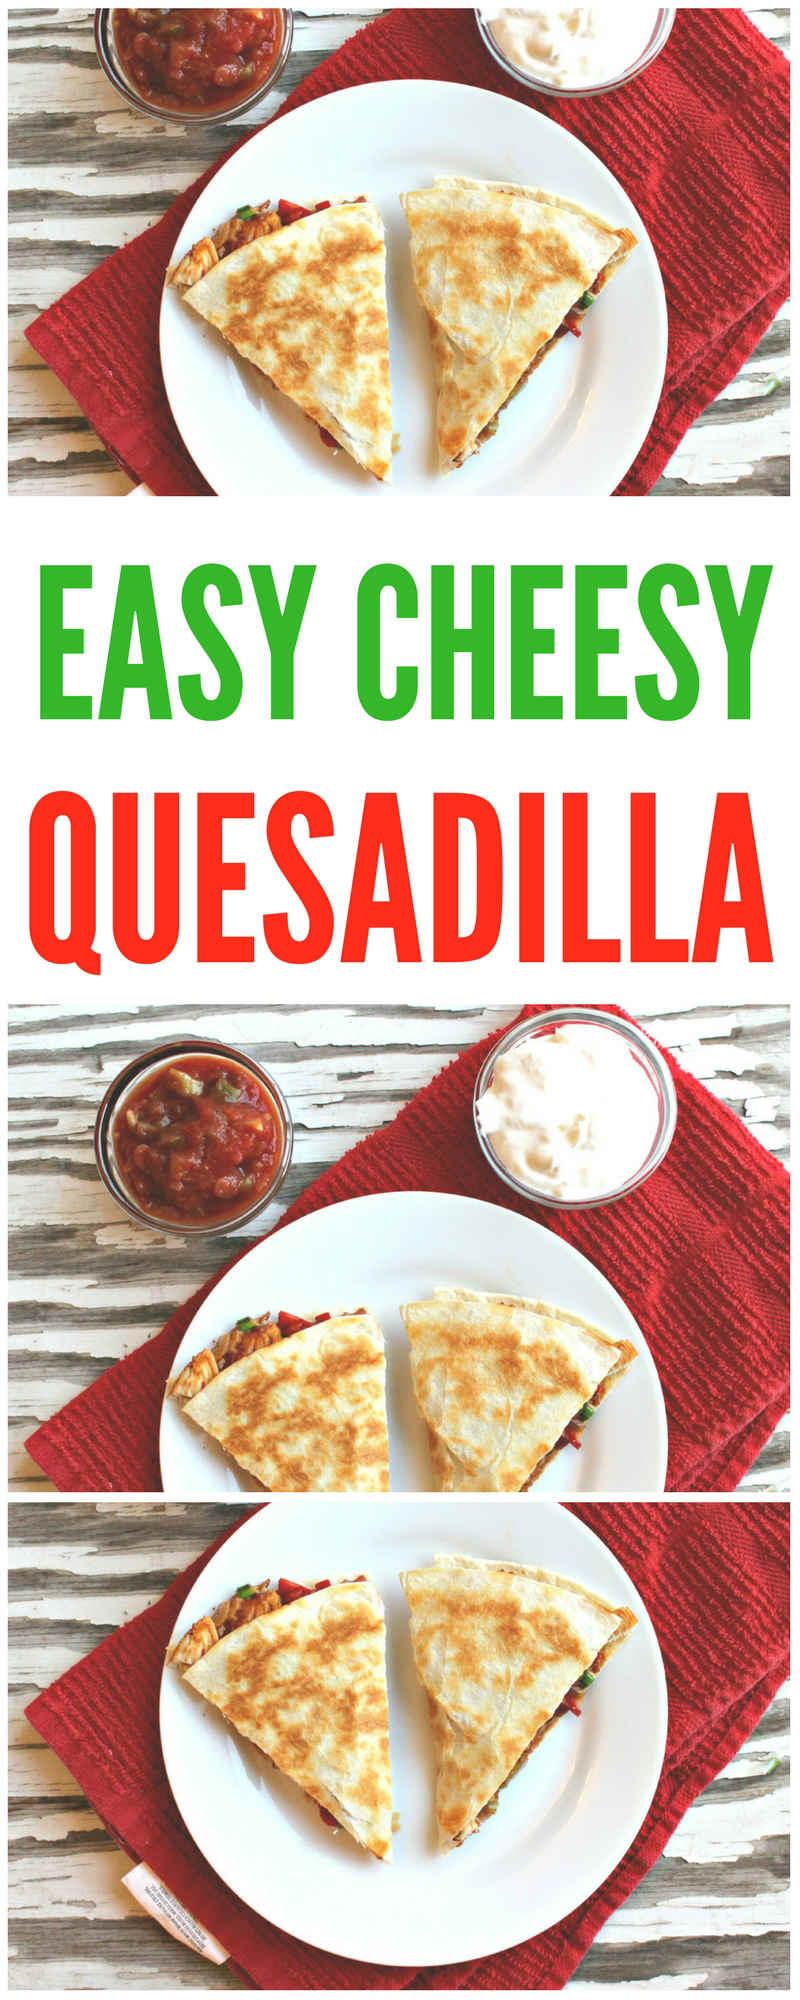 easy cheesy veggie quesadilla with black beans | | vegetarian quesadilla | campbells soup quesadilla | homemade | vegetables | queso | tofu quesadilla